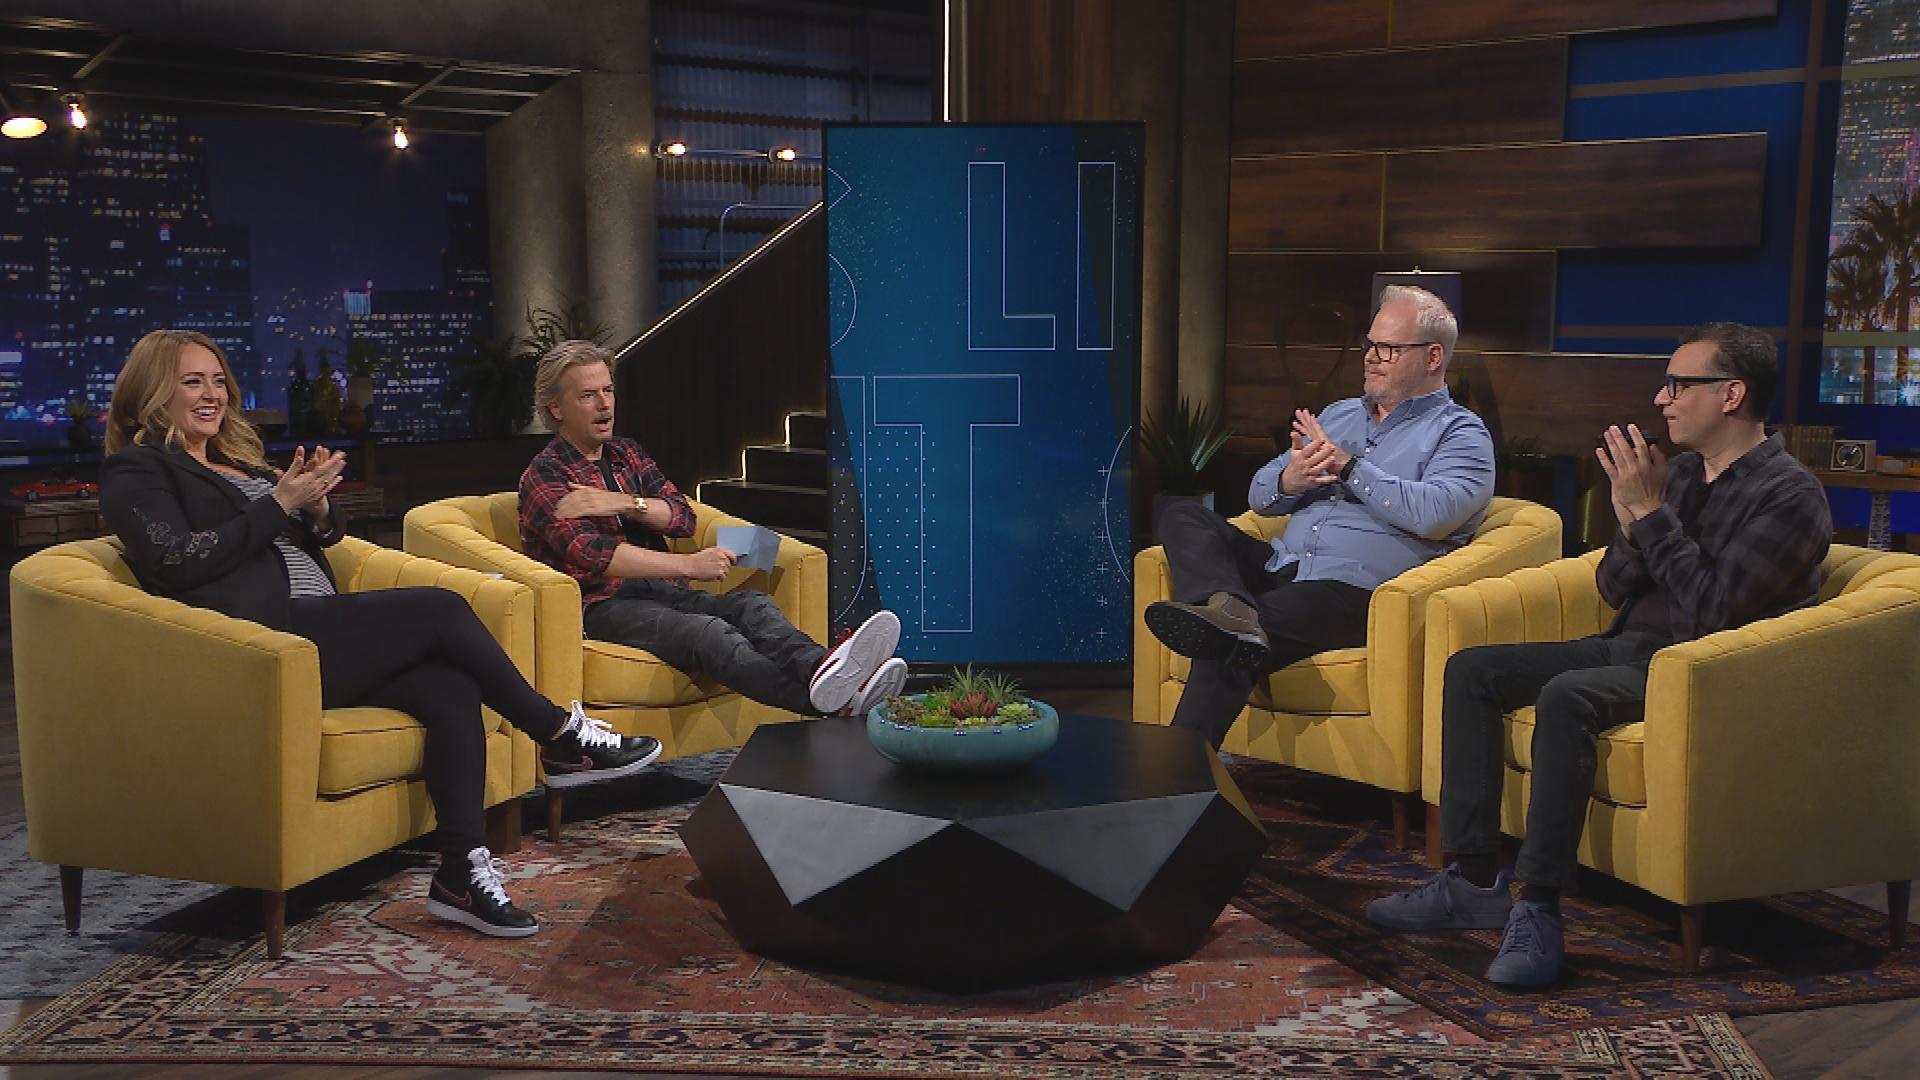 September 18, 2019 - Jim Gaffigan, Sarah Tiana, Fred Armisen & Sean Penn